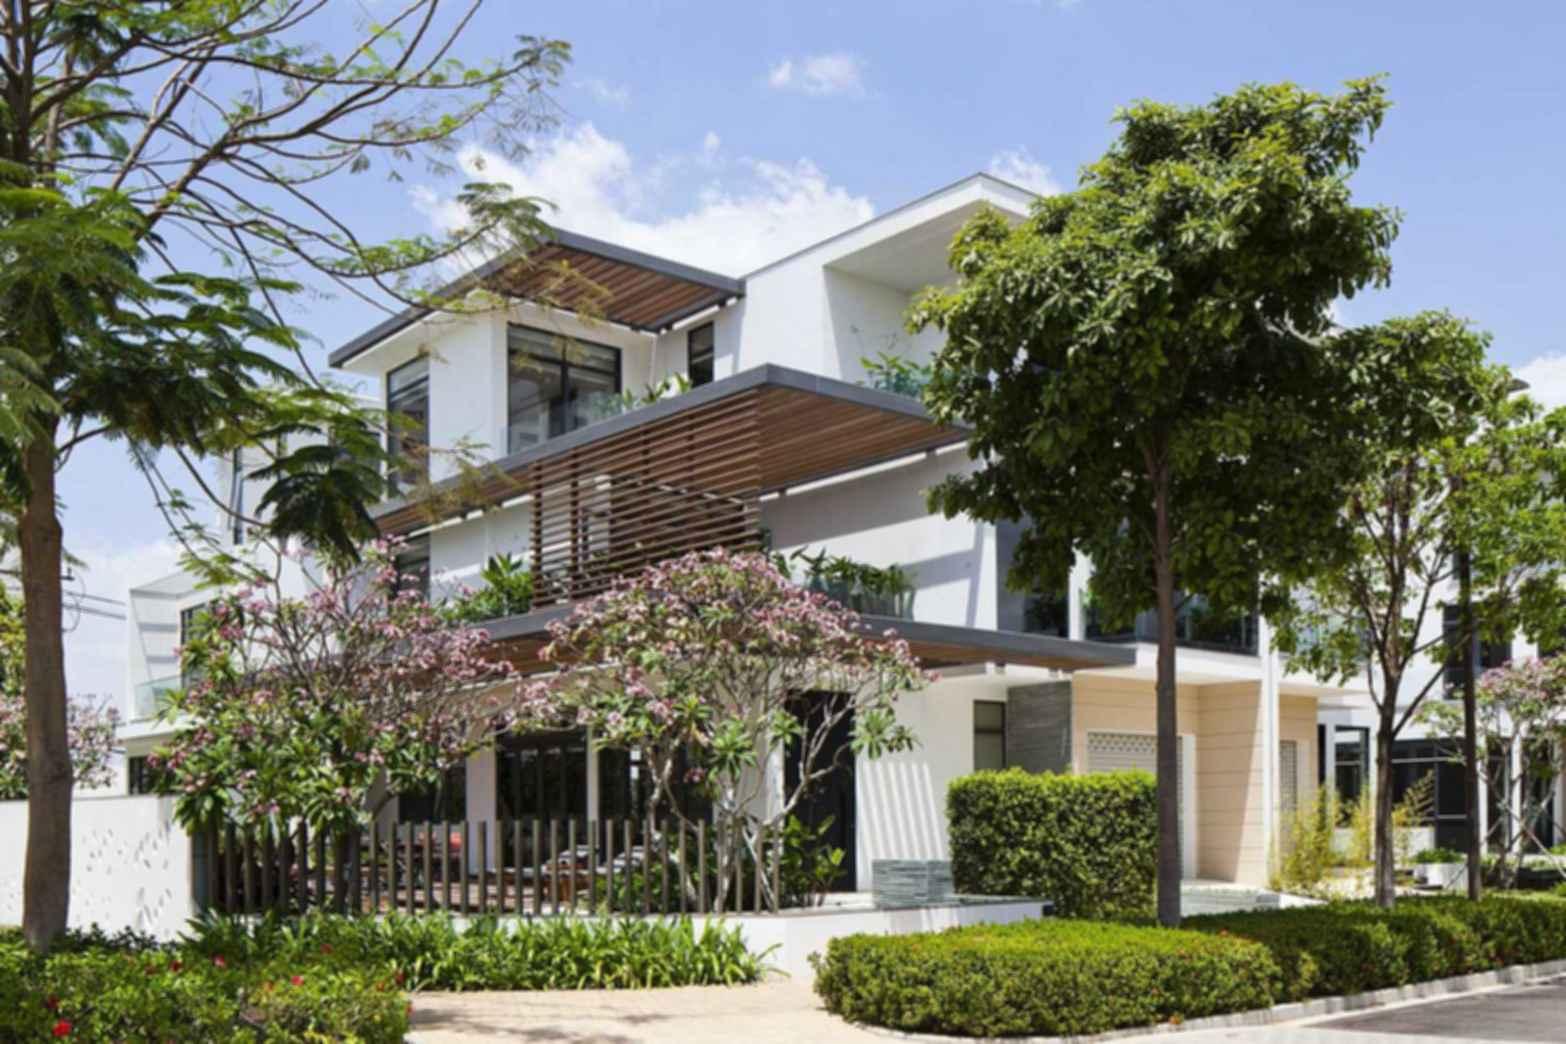 Indochina Villas Saigon - Exterior